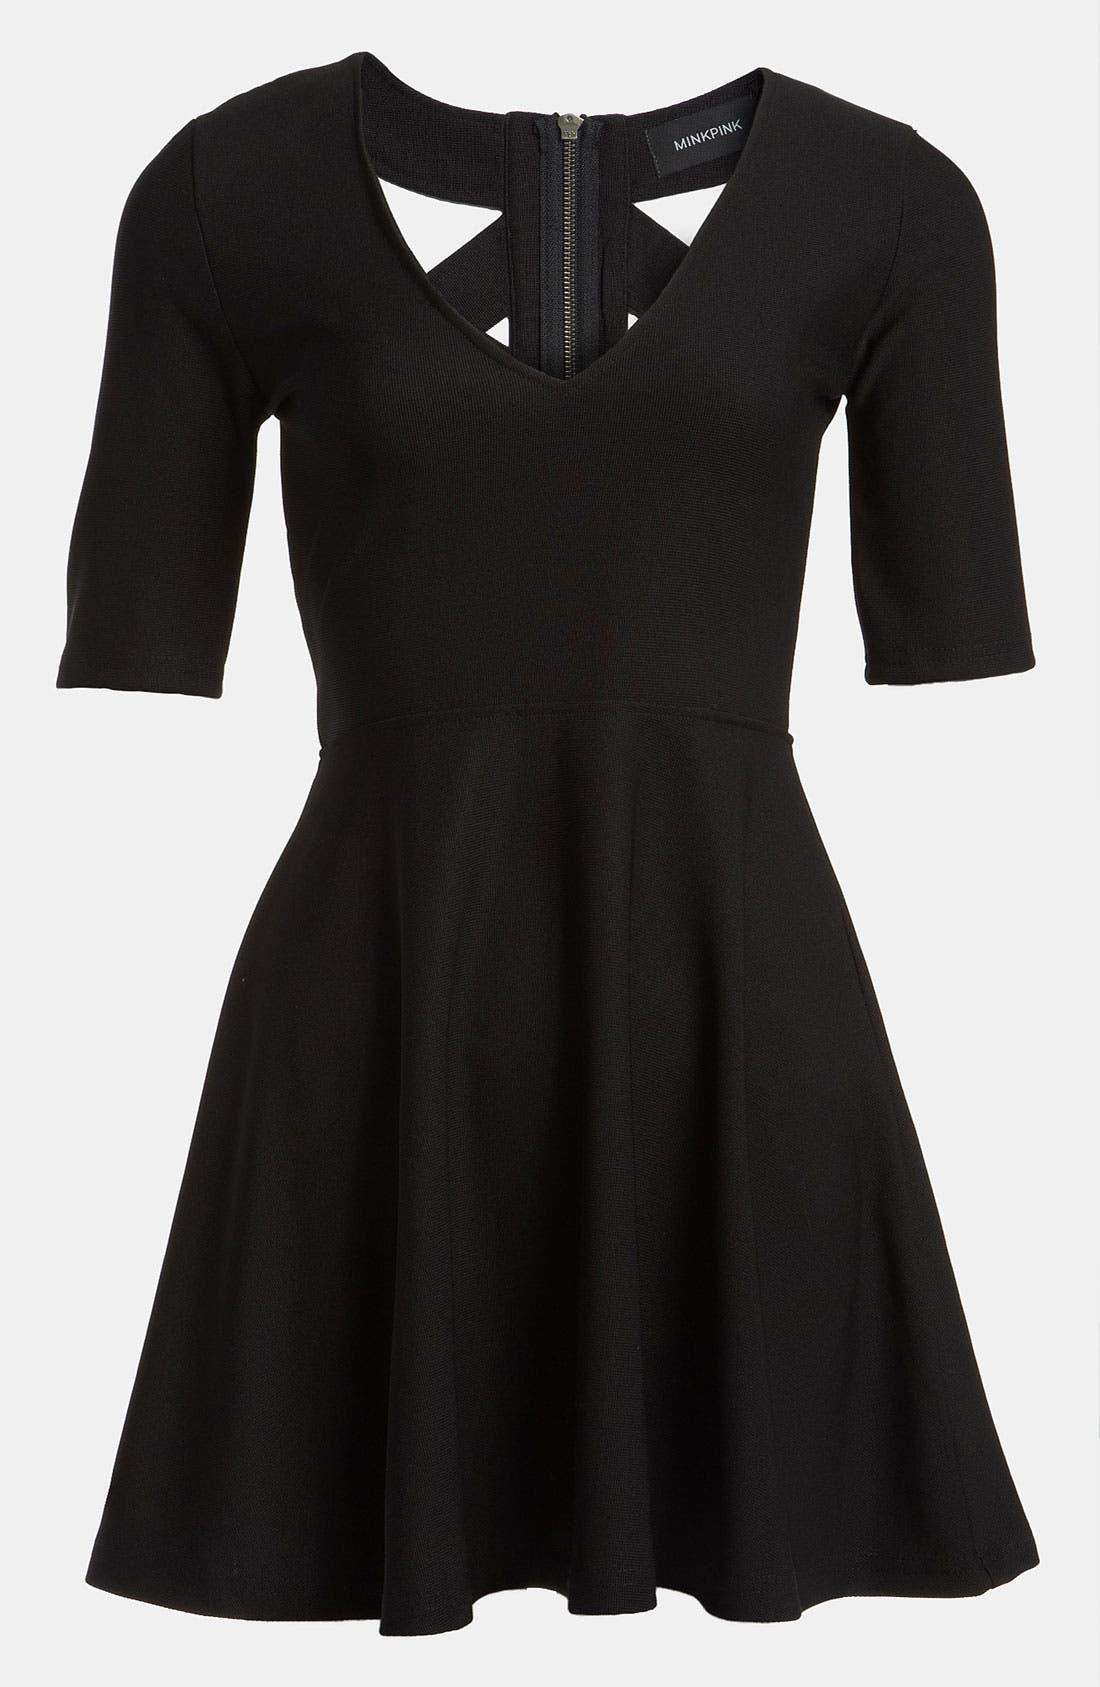 Main Image - MINKPINK 'All Coming Back' Dress